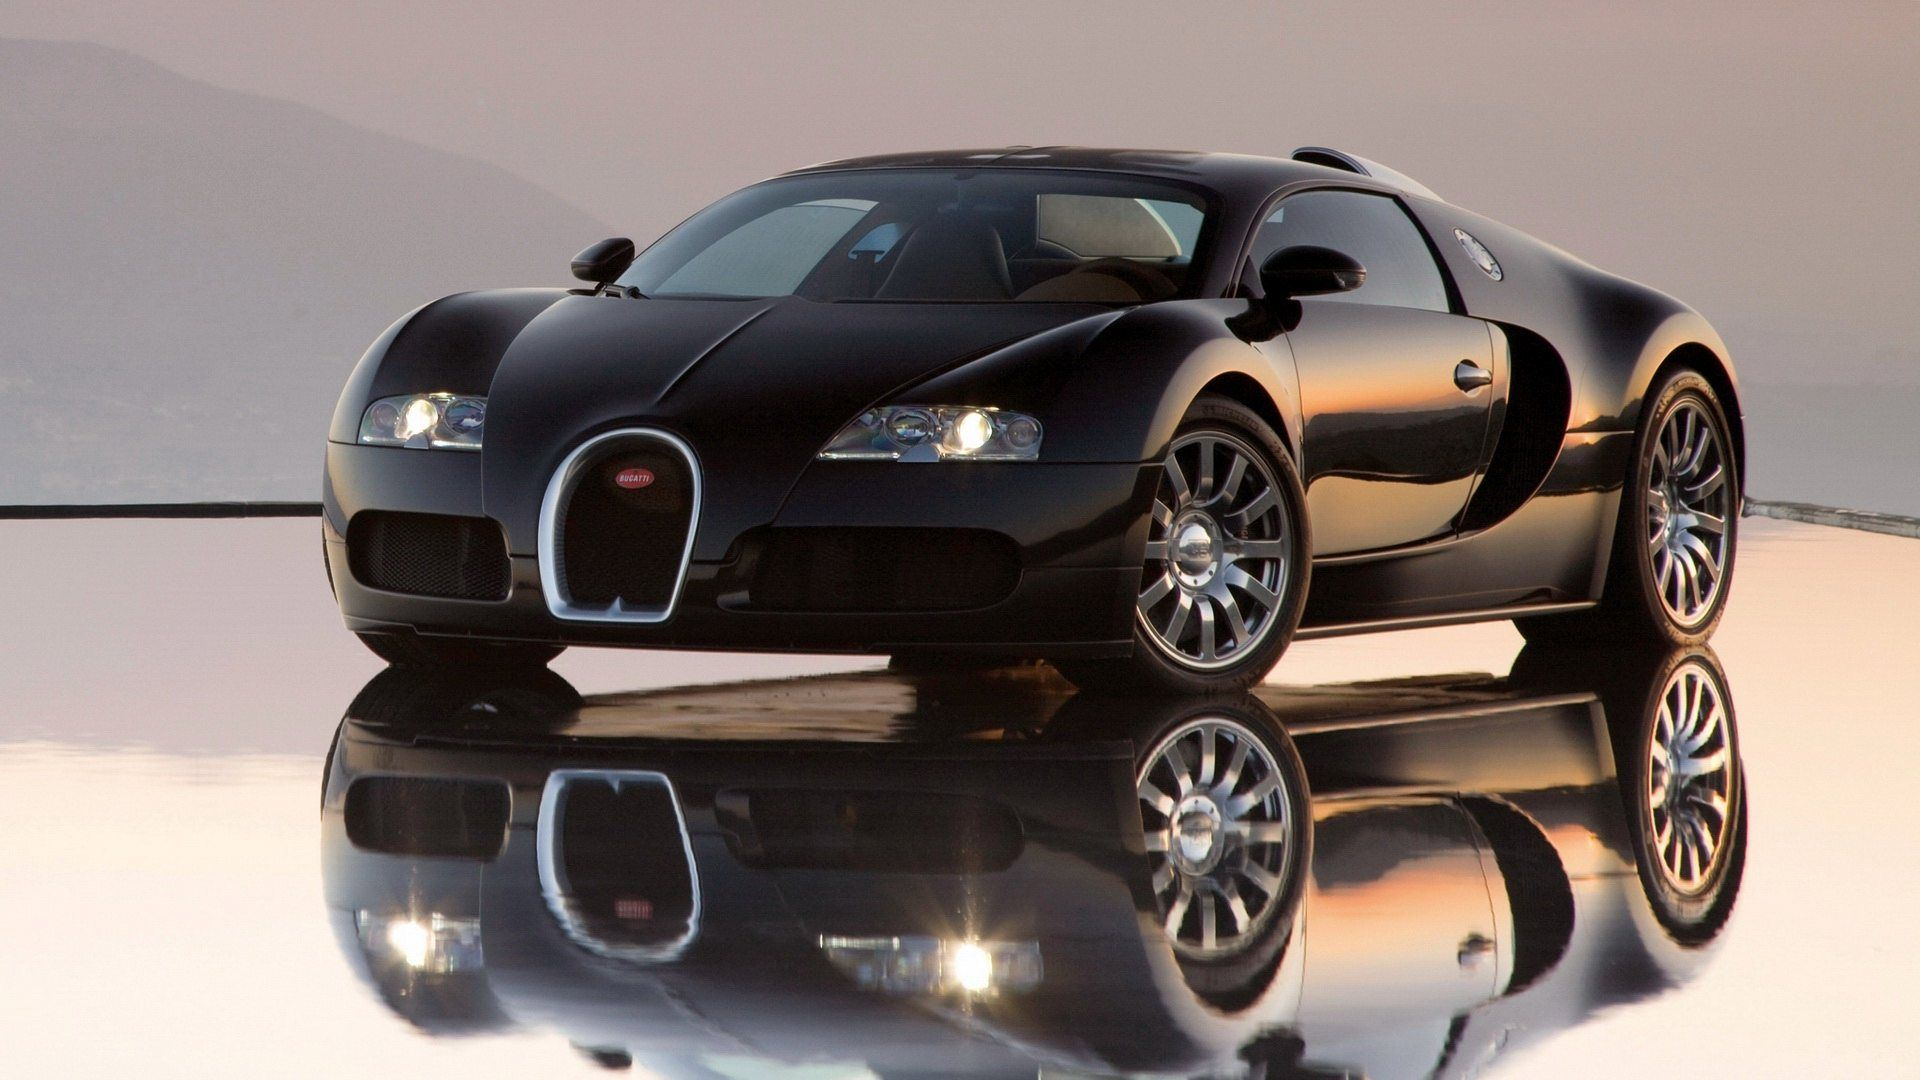 A Deep Dive Into The Iconic Bugatti Veyron Bugatti Veyron Supercars Net